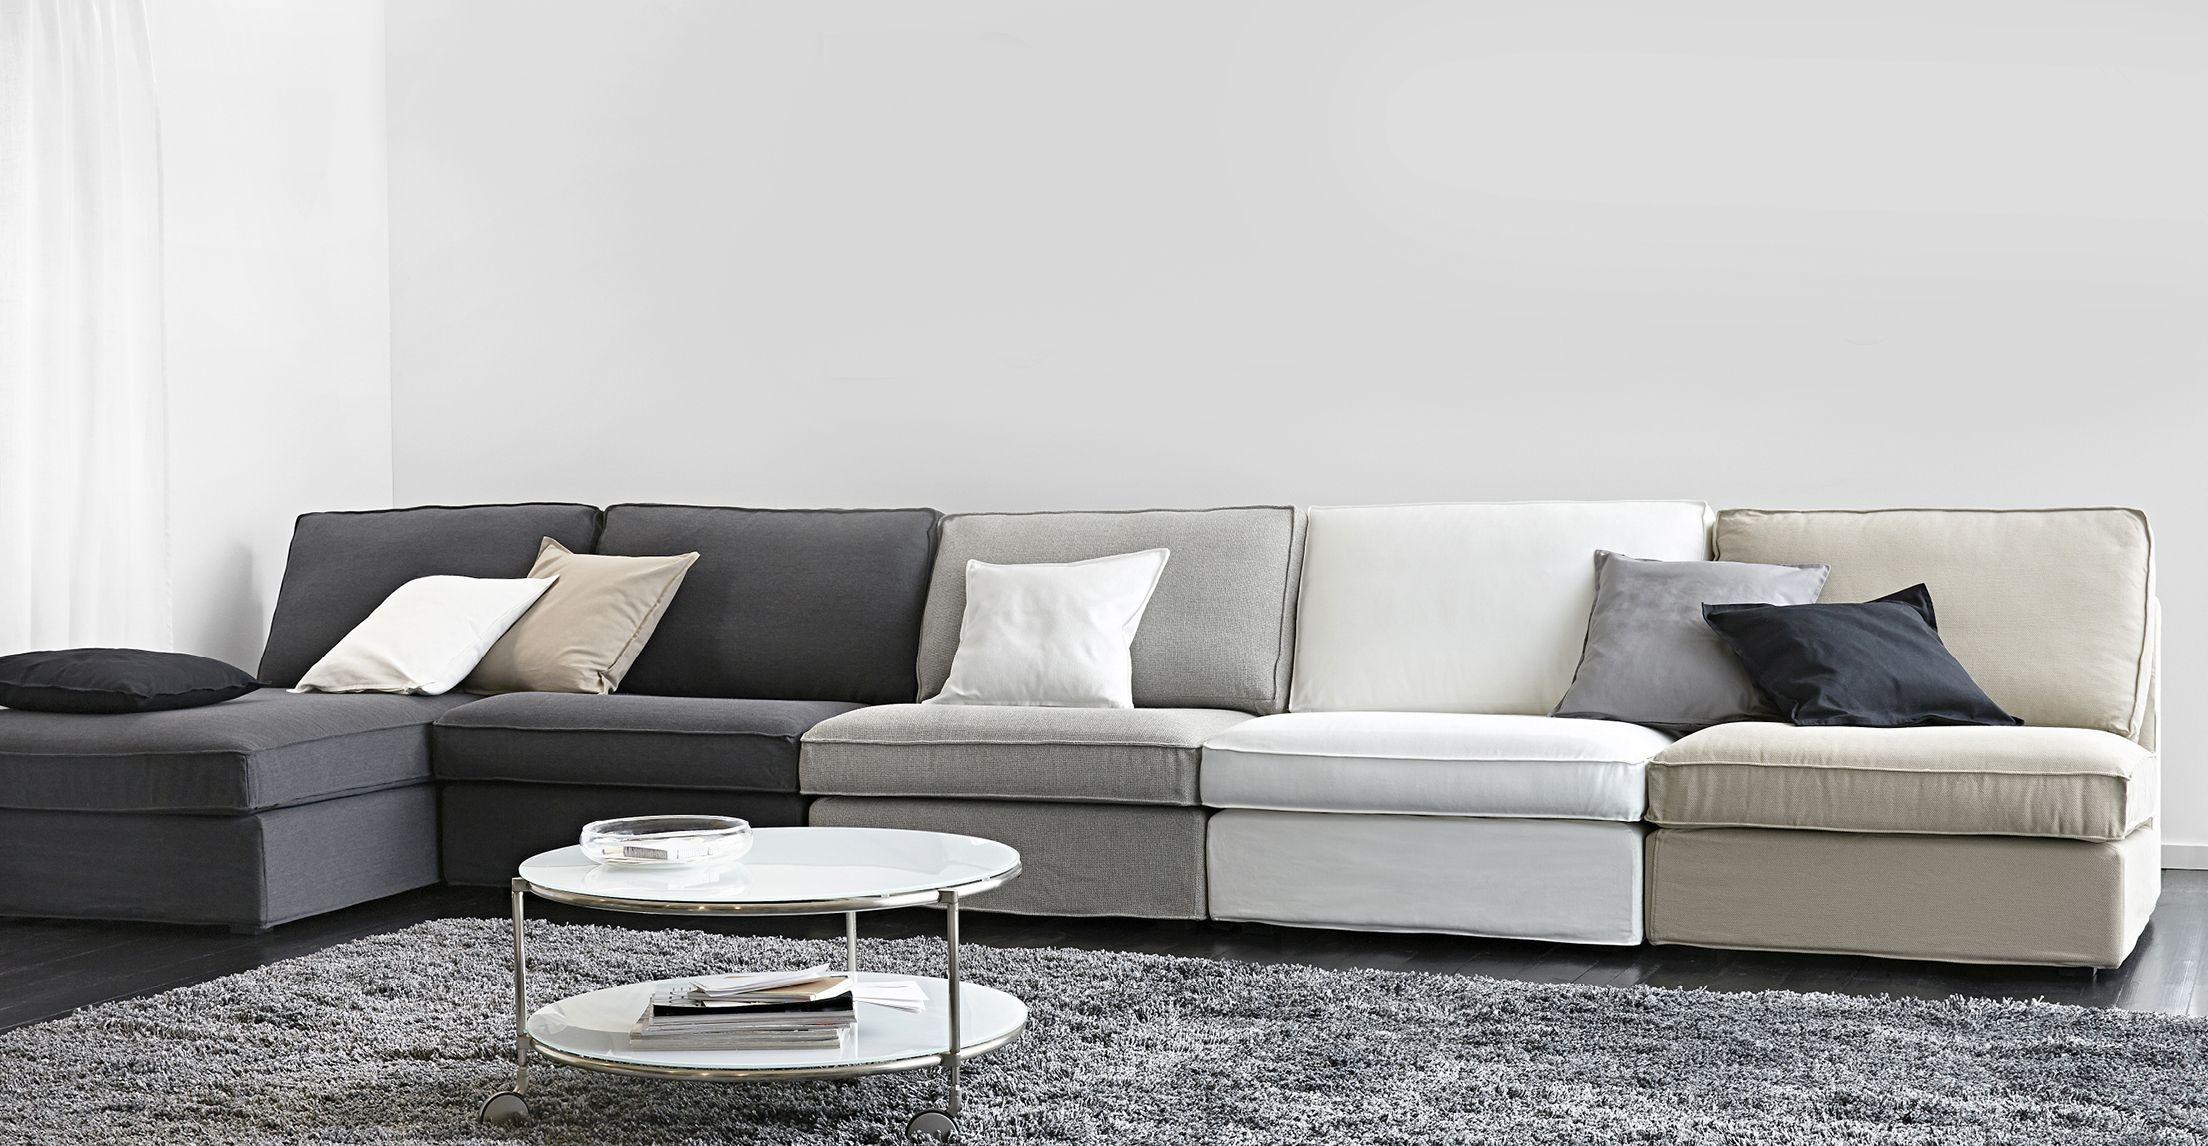 sofa ikea kivik opiniones fabric cleaner machine google search vallentuna hack furniture